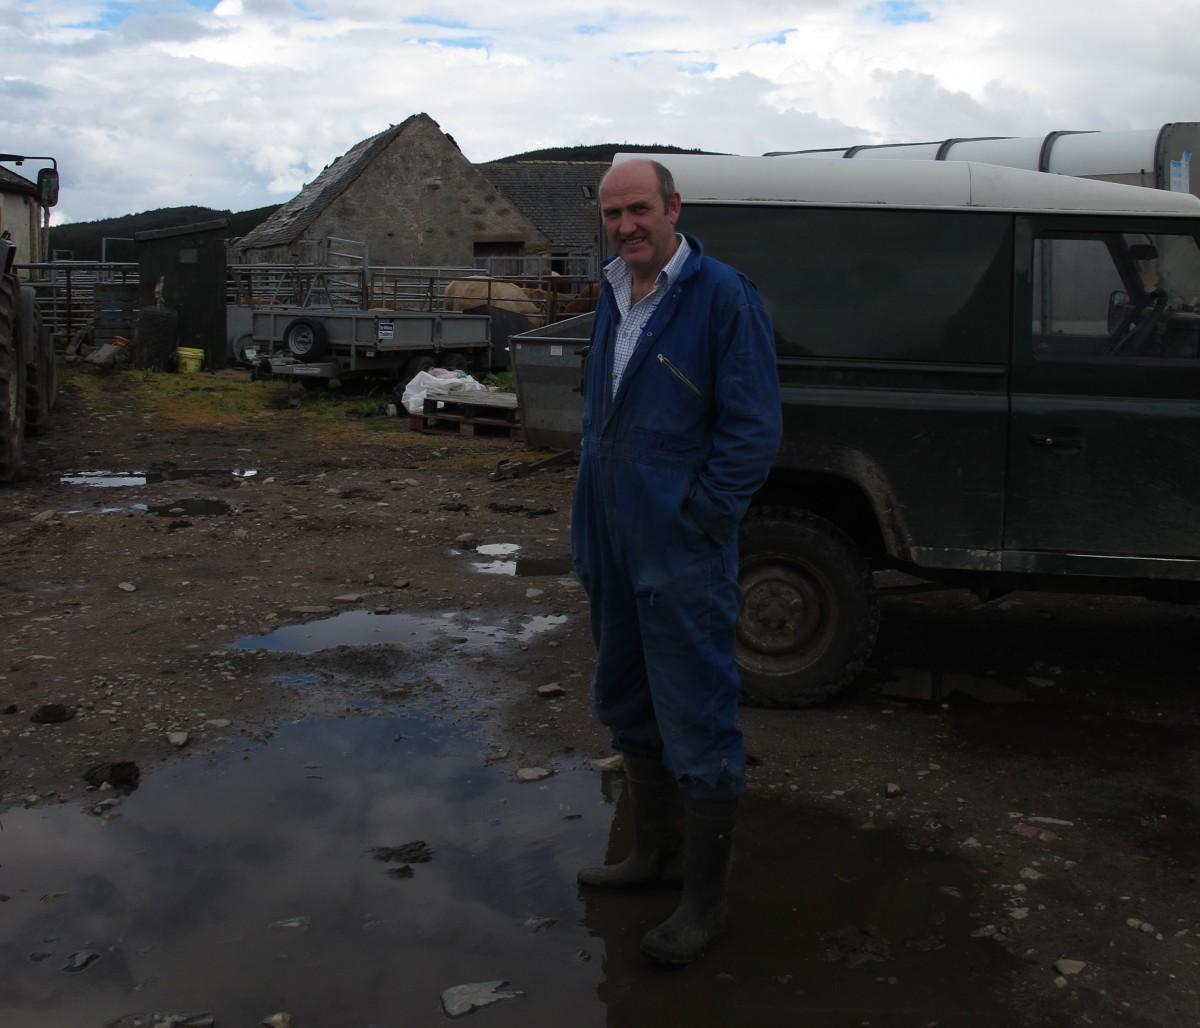 David MacQueen at Dalmagarry Farm